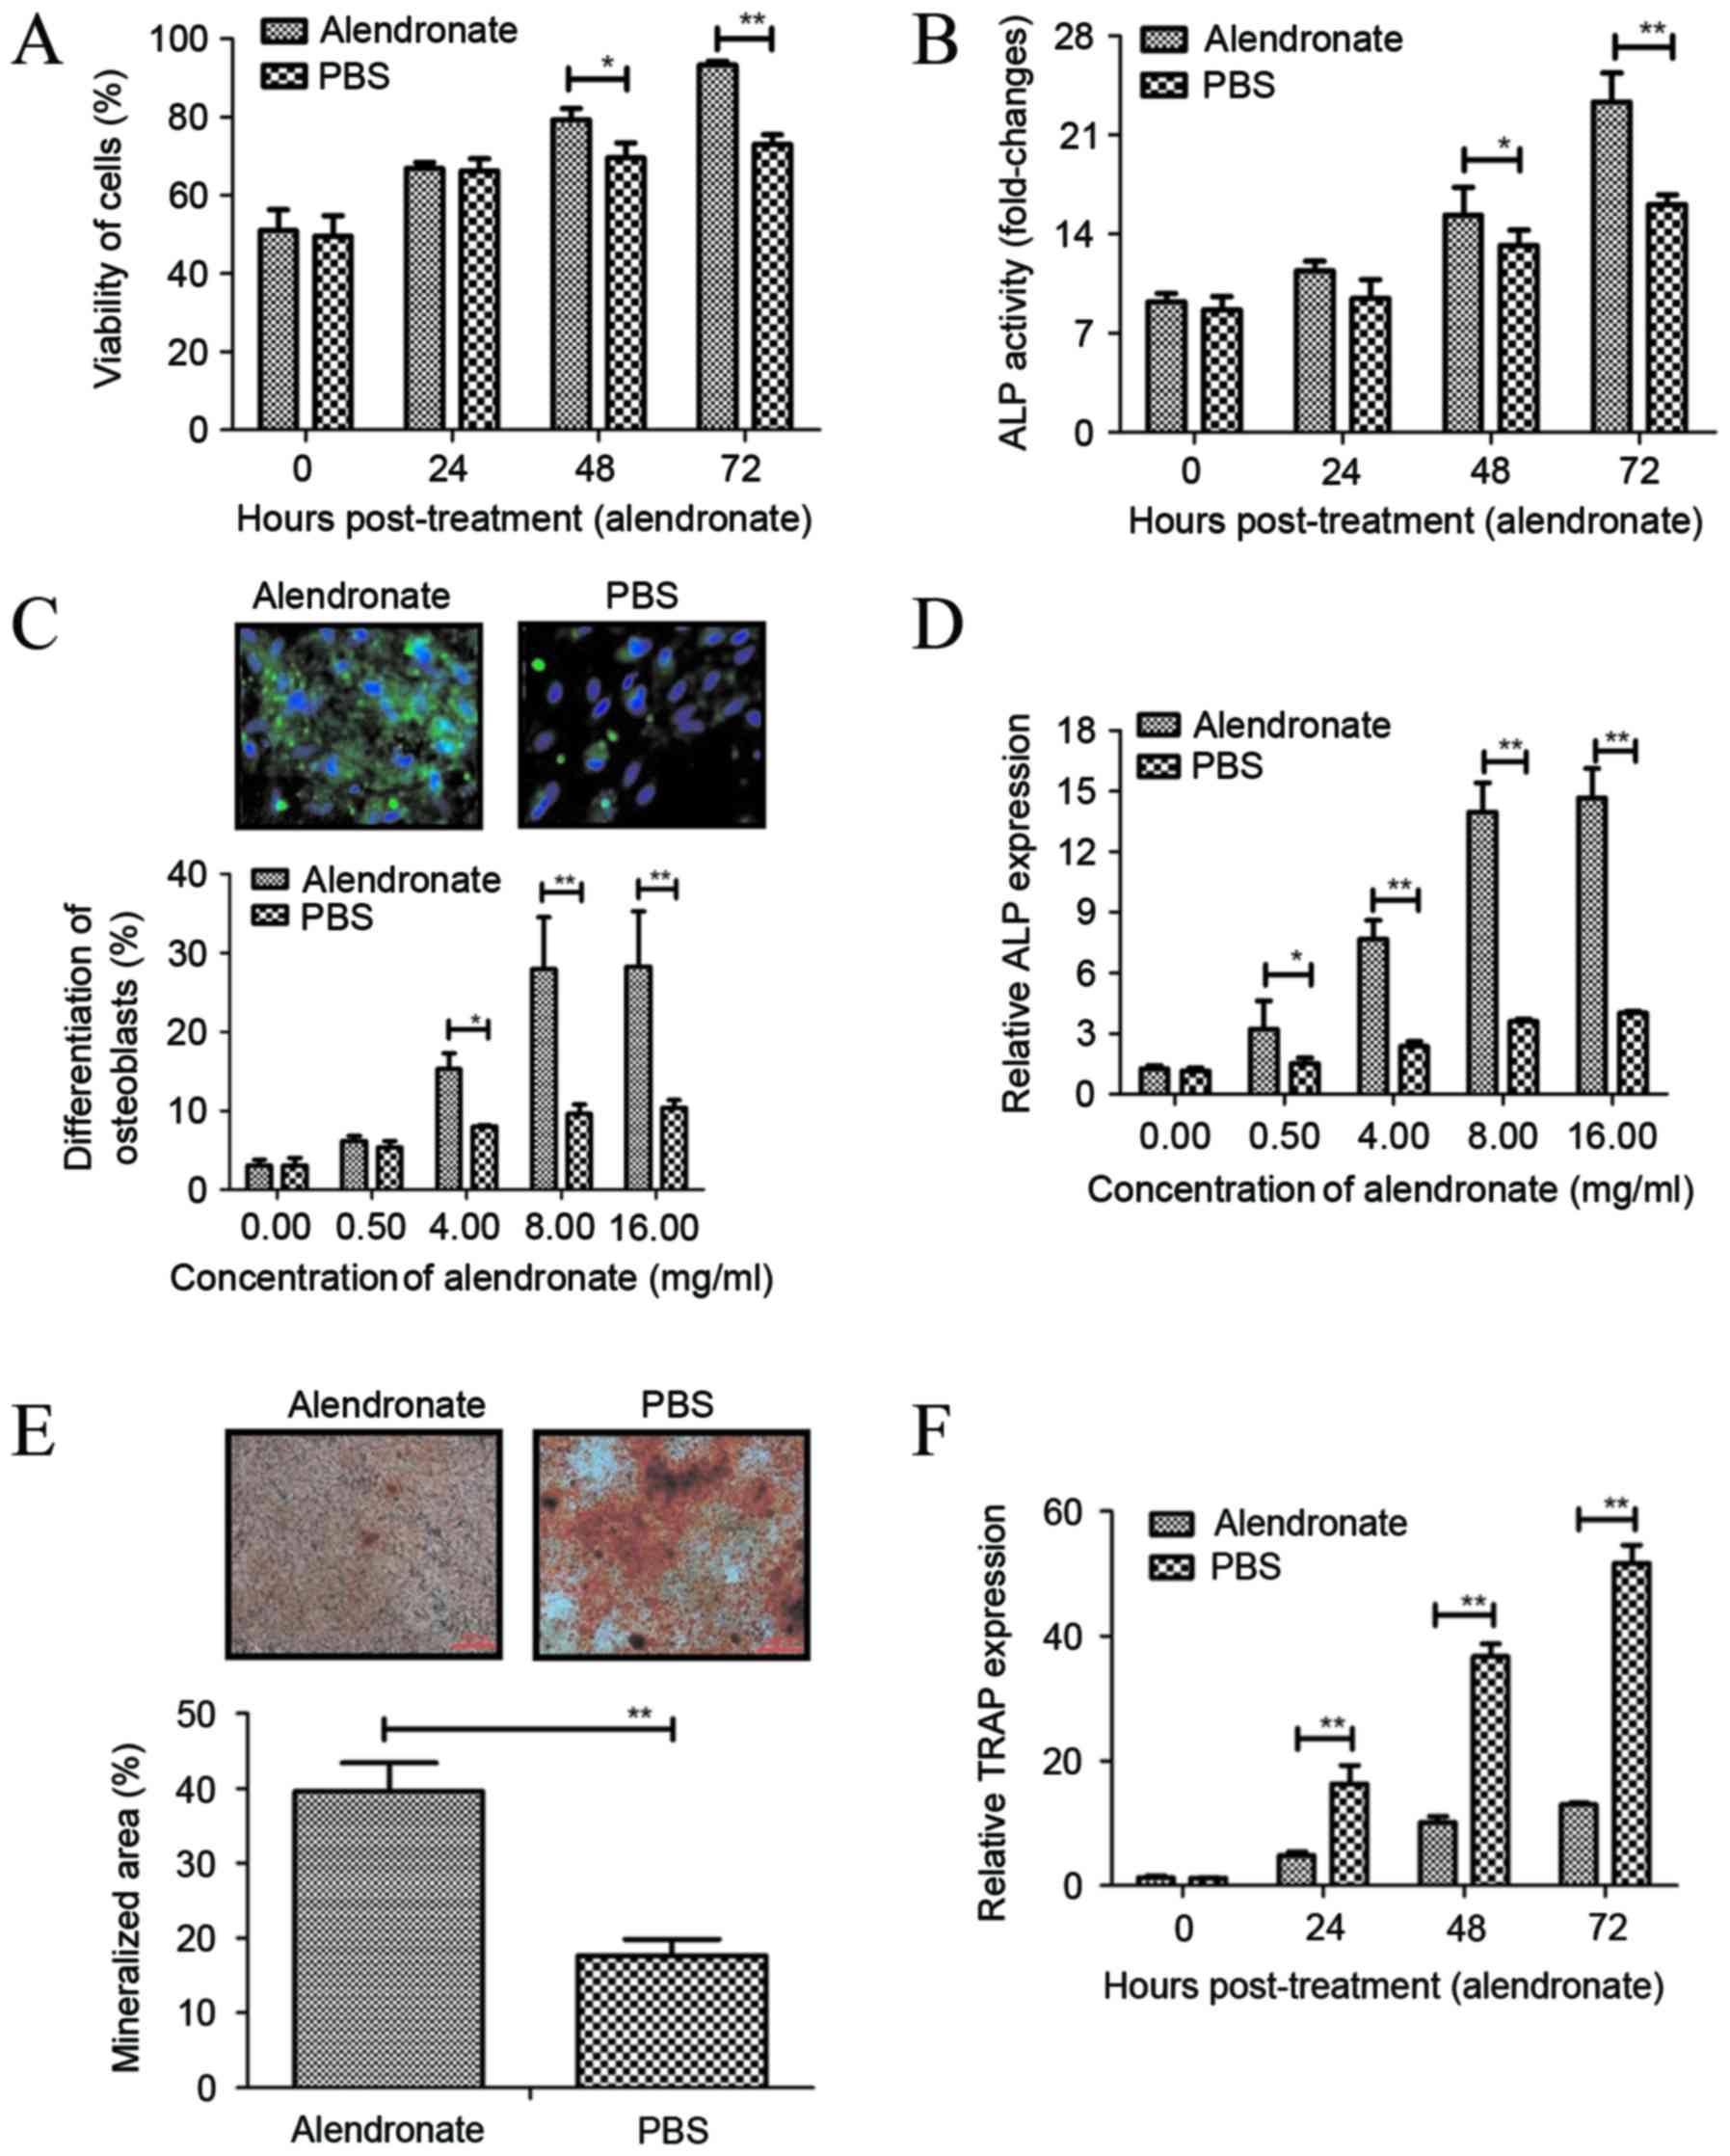 Alendronate promotes osteoblast differentiation and bone